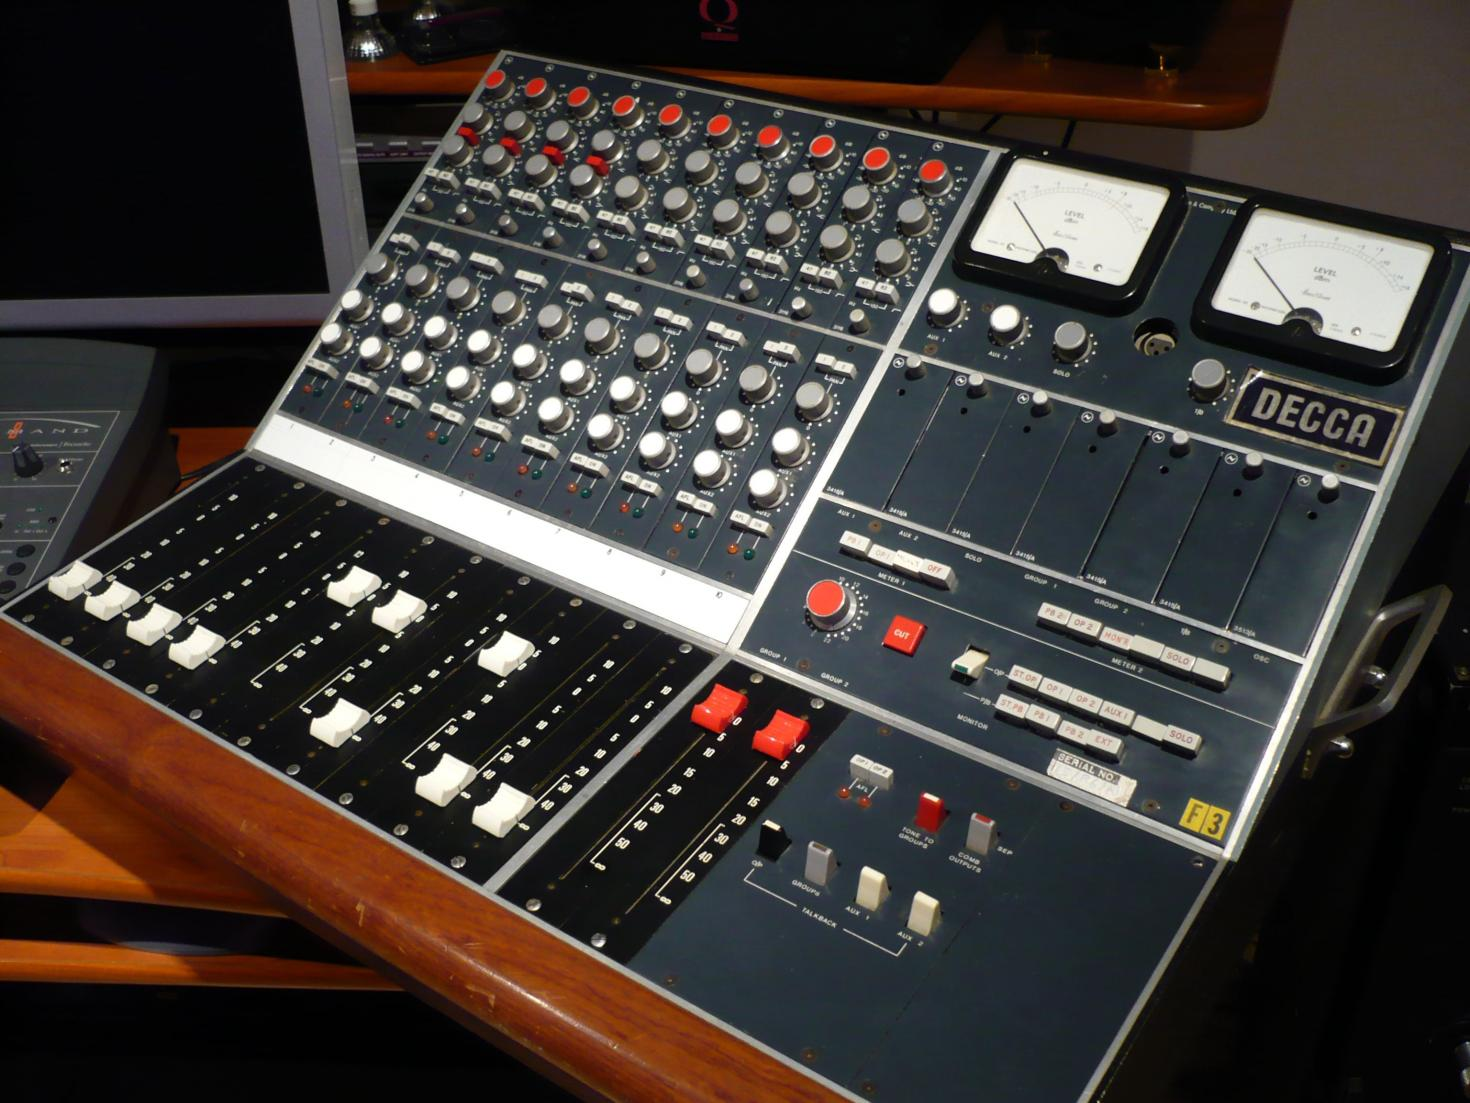 decca neve 10 into 2 channel console gearslutz pro audio community. Black Bedroom Furniture Sets. Home Design Ideas